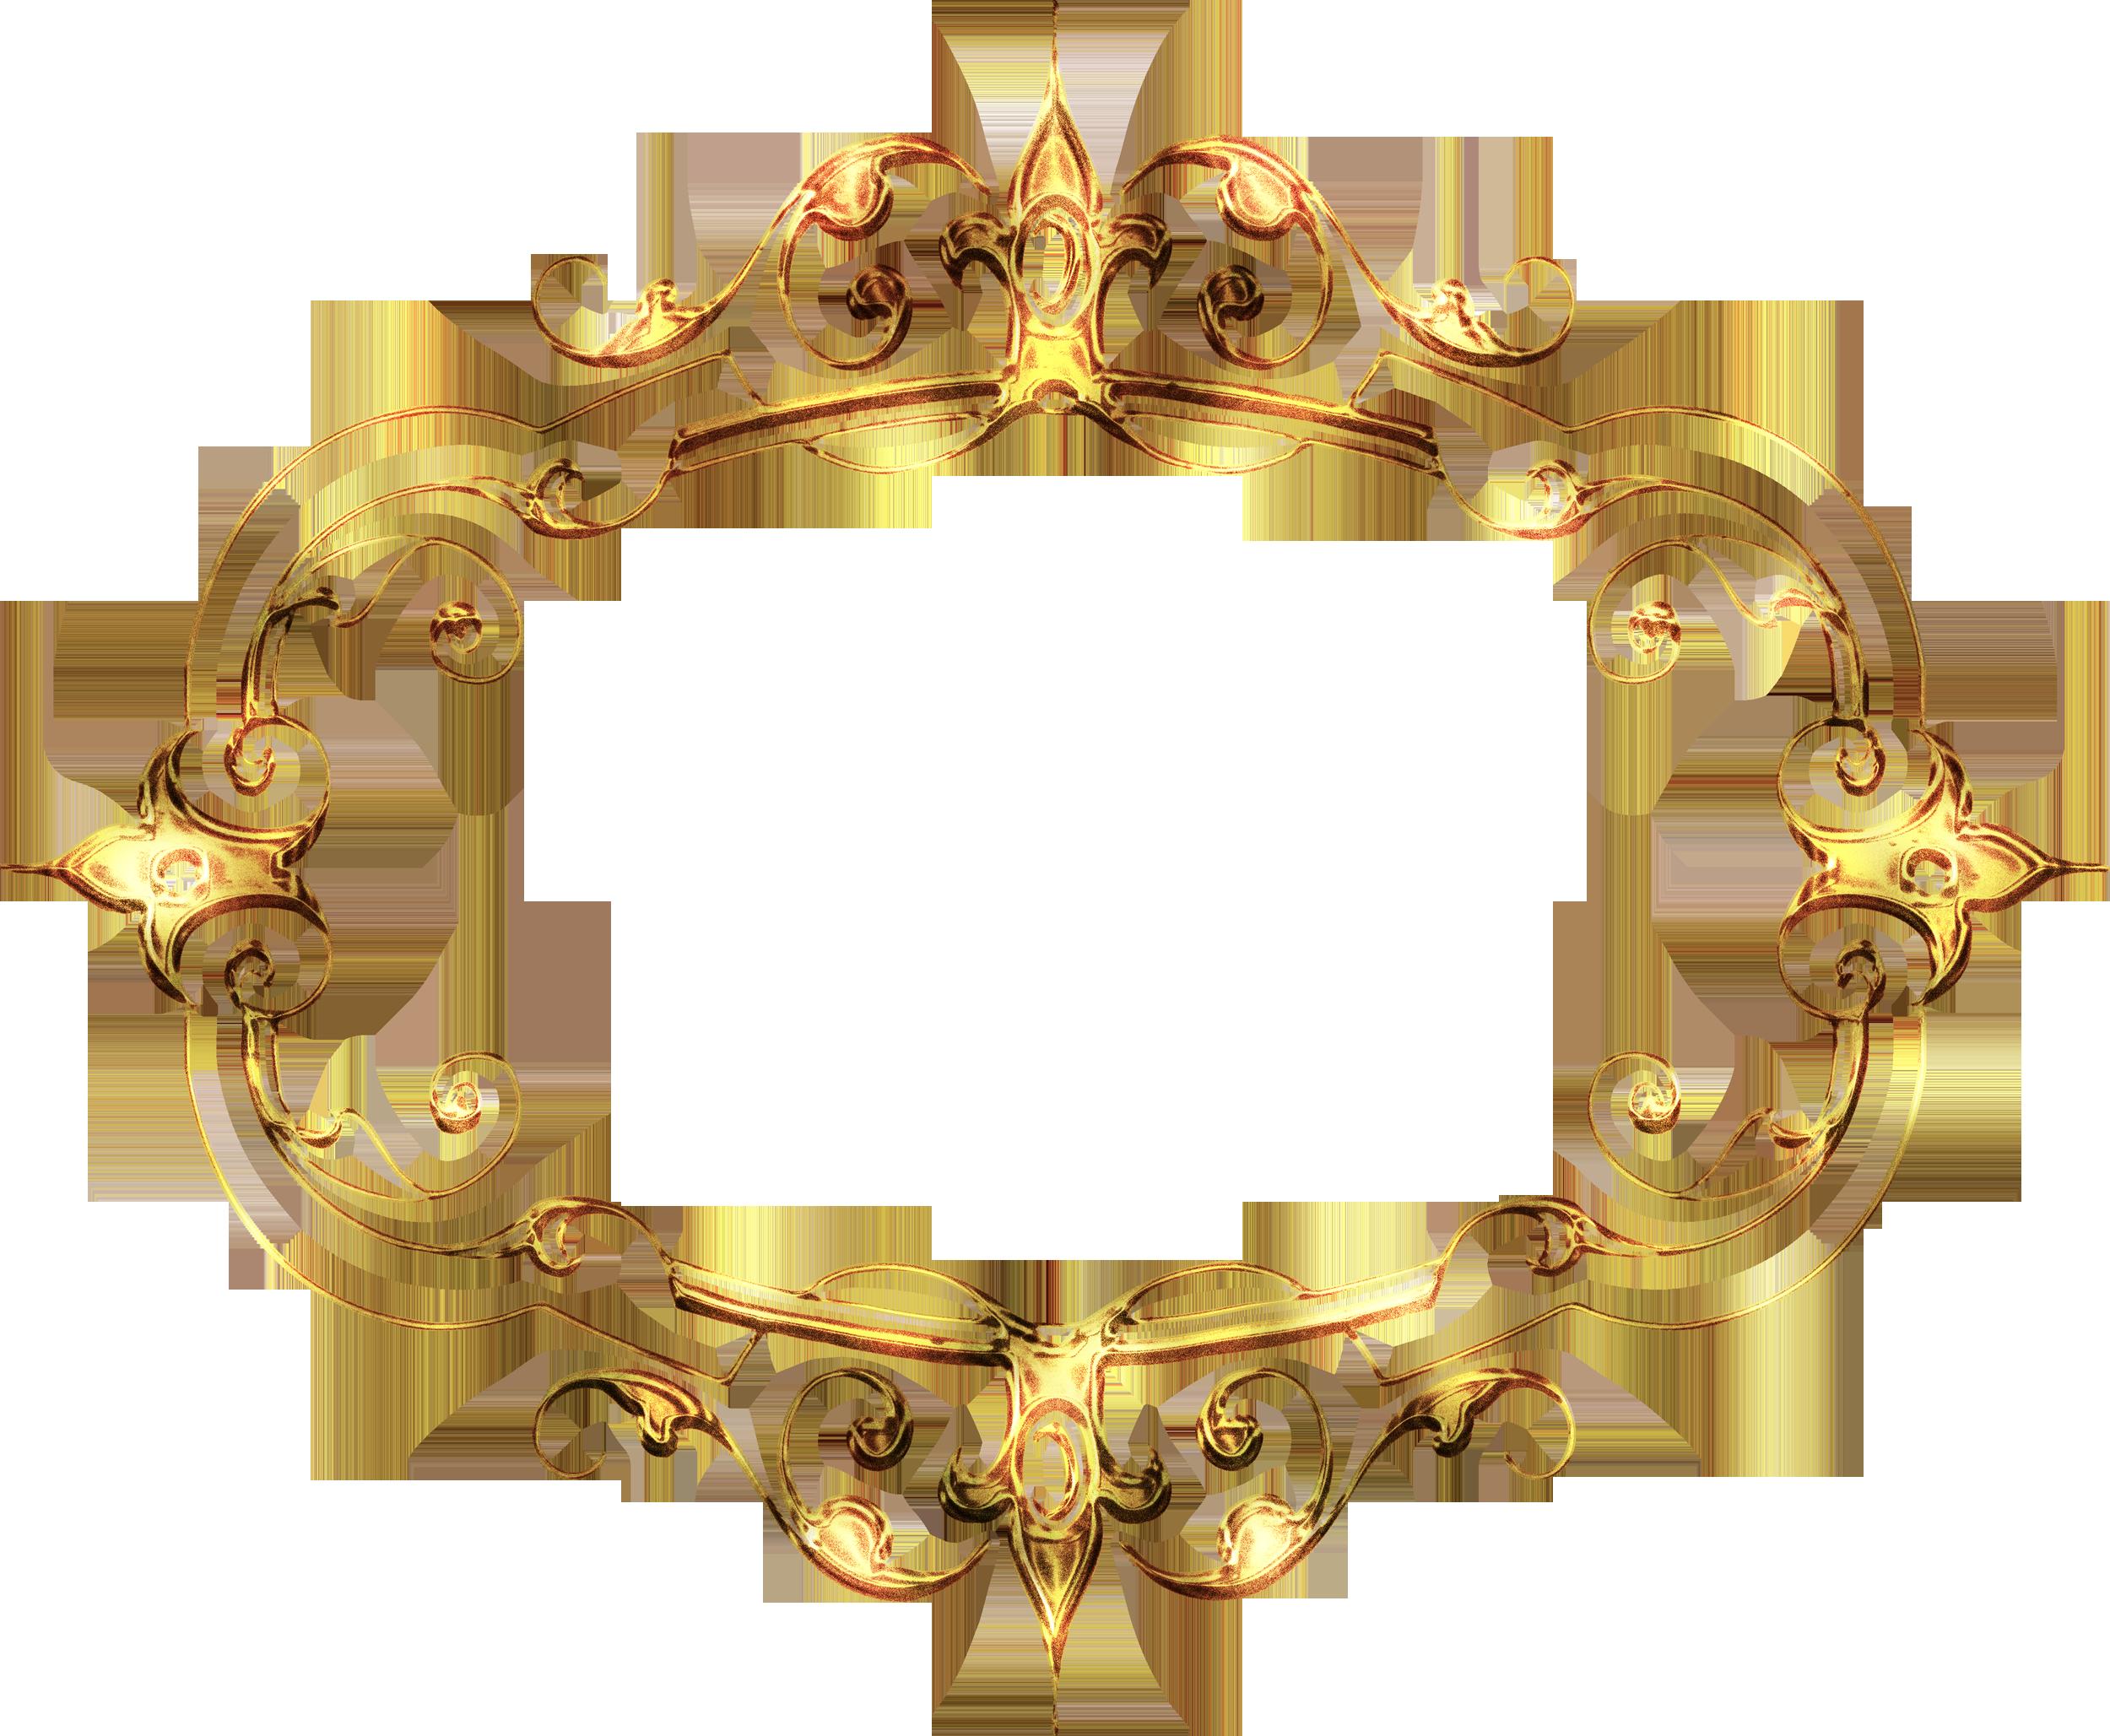 Золотые рамки - Кира-скрап - клипарт и рамки на прозрачном ...